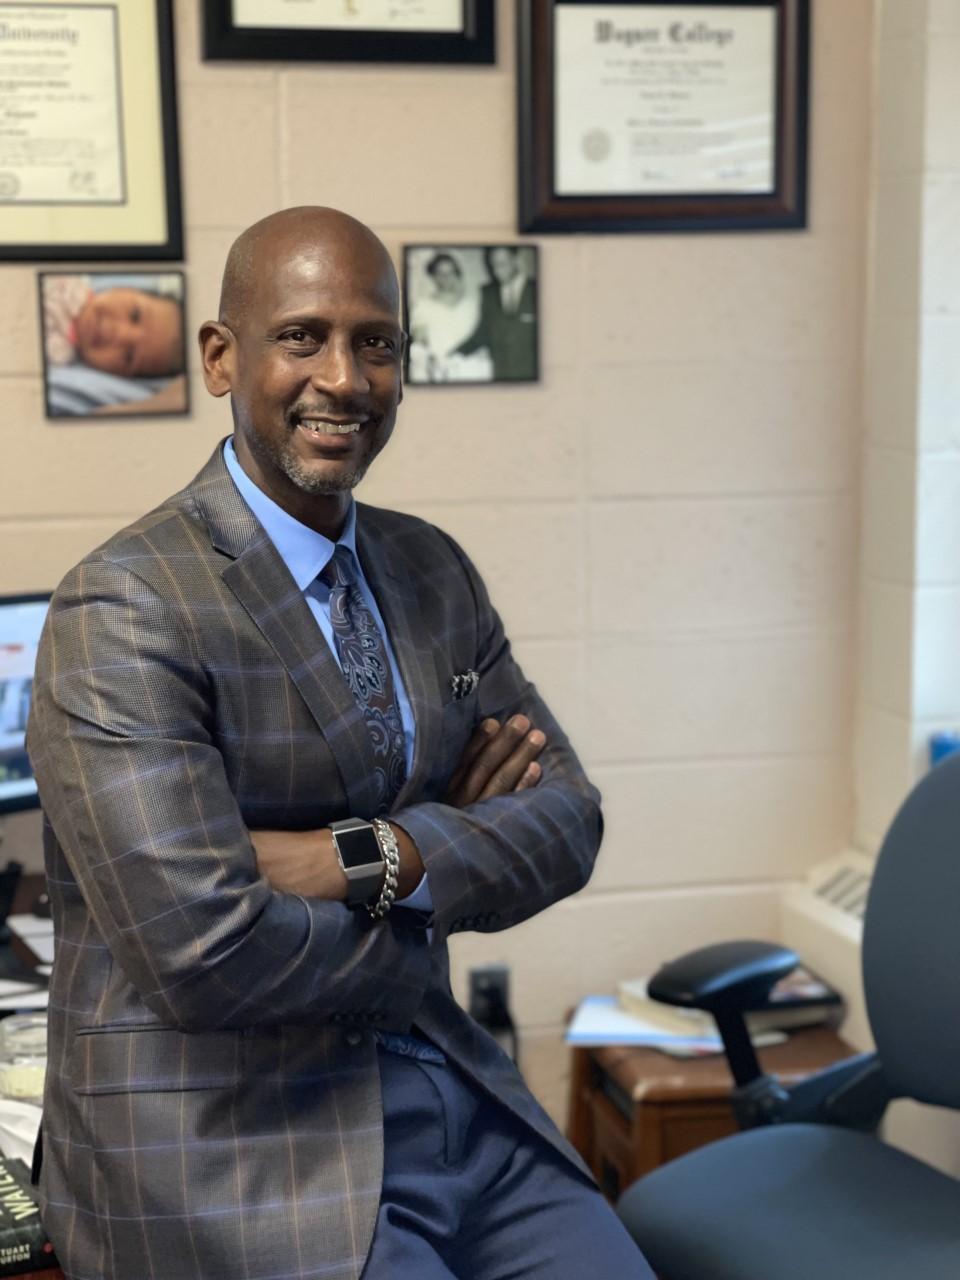 Assistant Principal Esrom Johnson